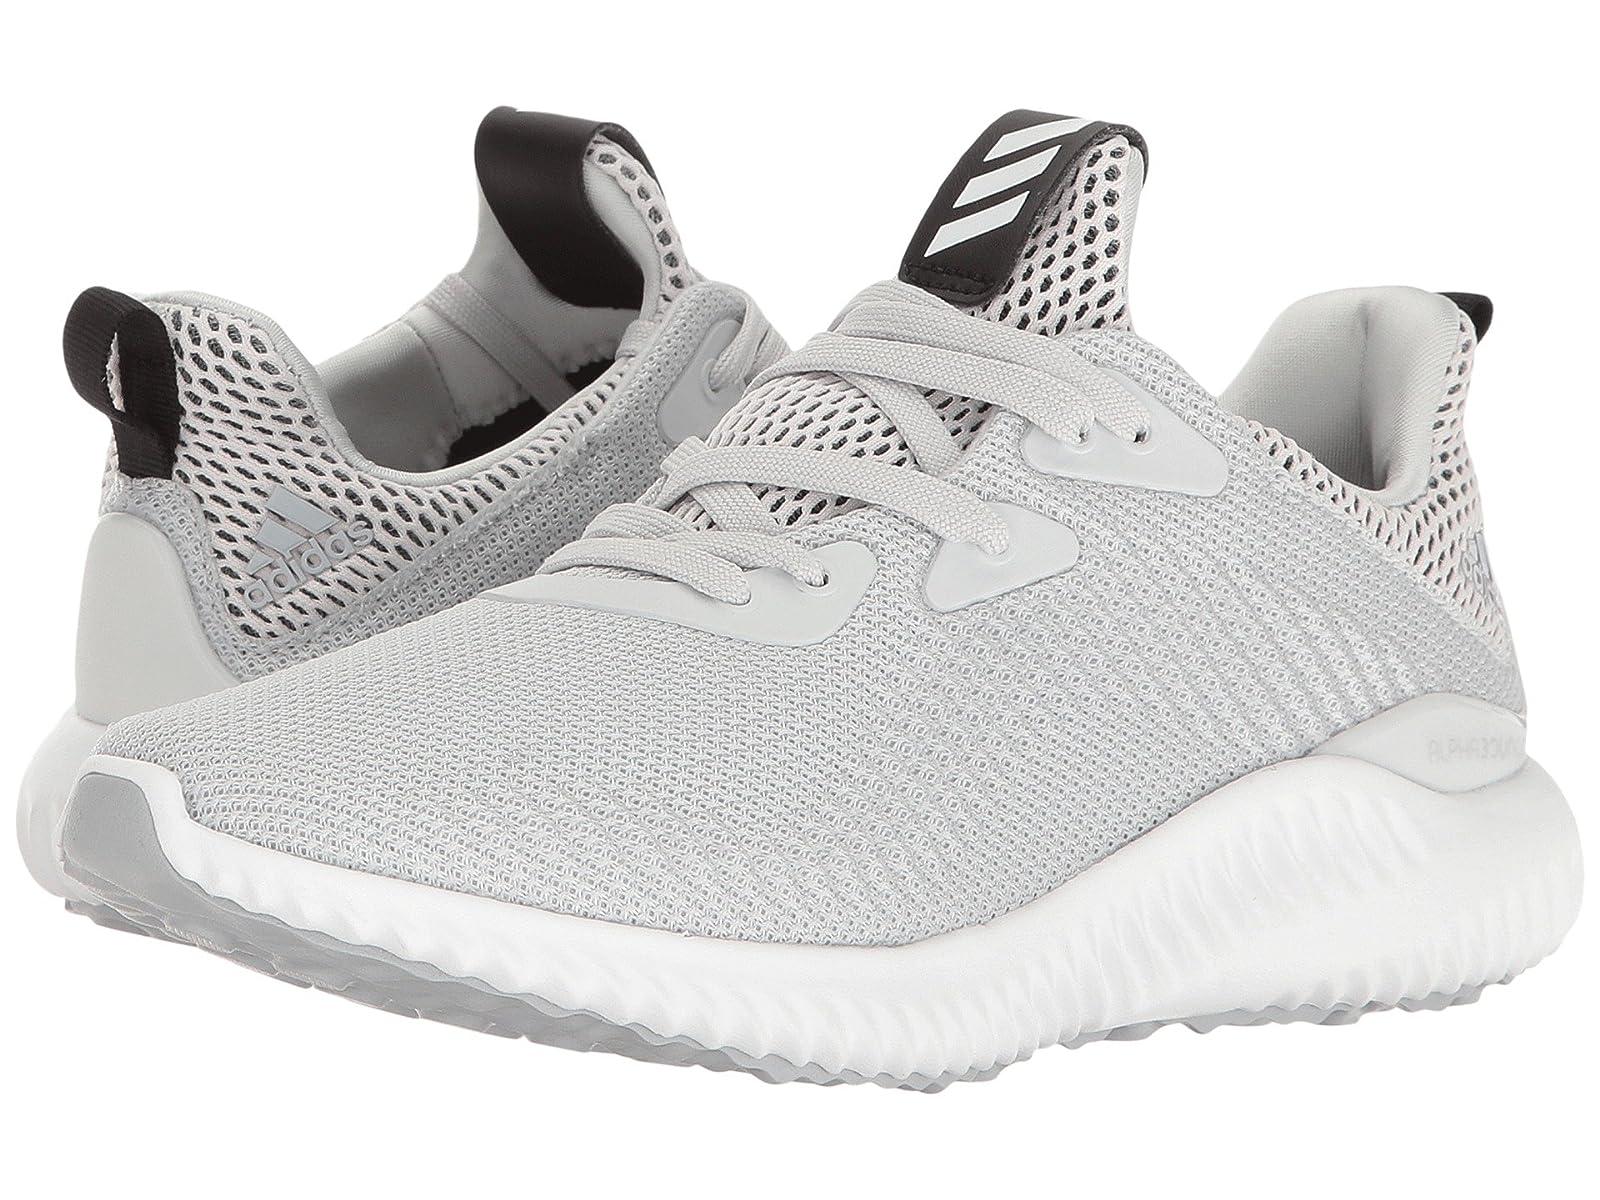 adidas Kids Alphabounce (Big Kid)Stylish and characteristic shoes